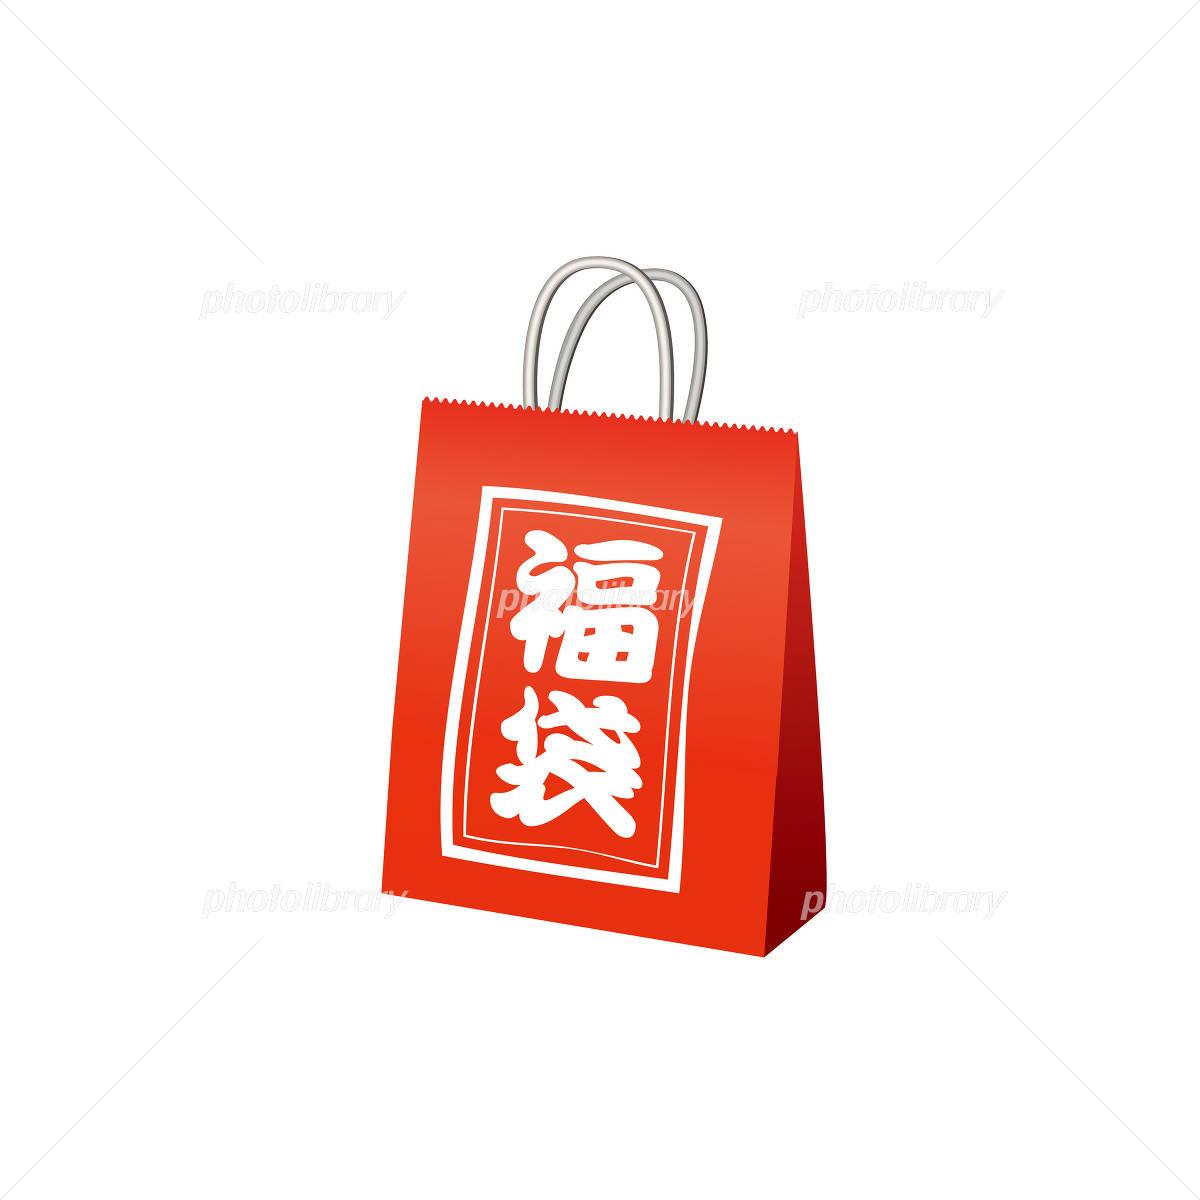 Grab-bag of illustrations イラスト素材